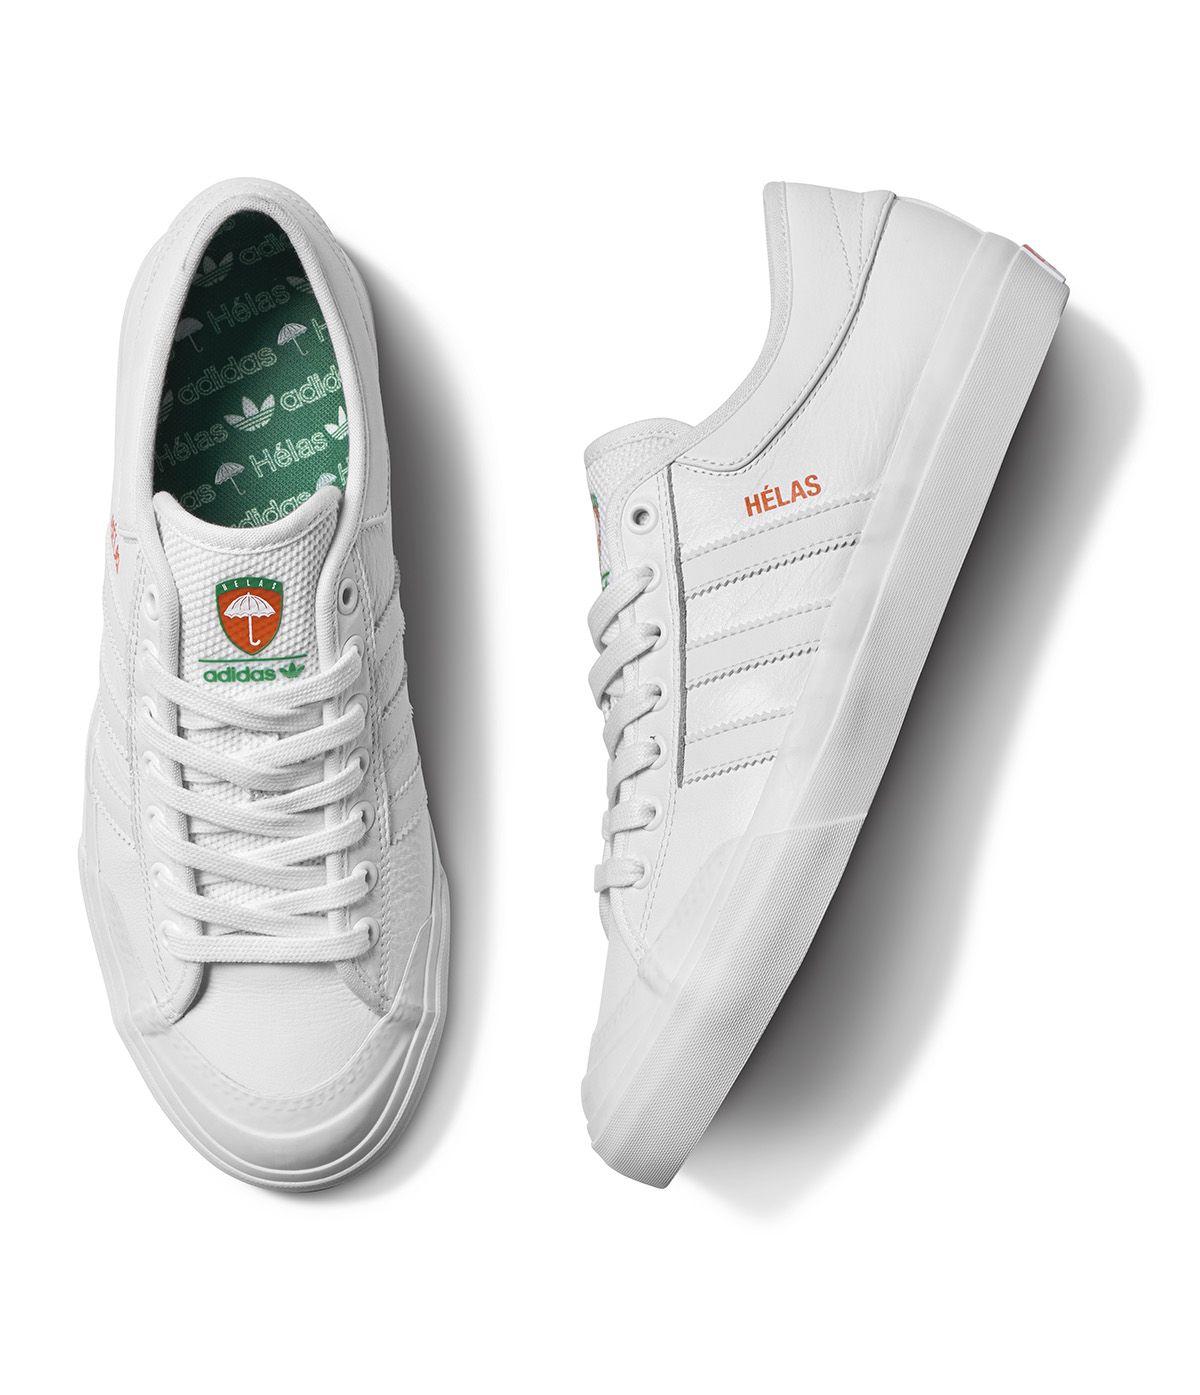 adidas ORIGINALS X HÉLAS POLO SHIRT MEN/'S WHITE SKATEBOARDING SKATING TENNIS NEW